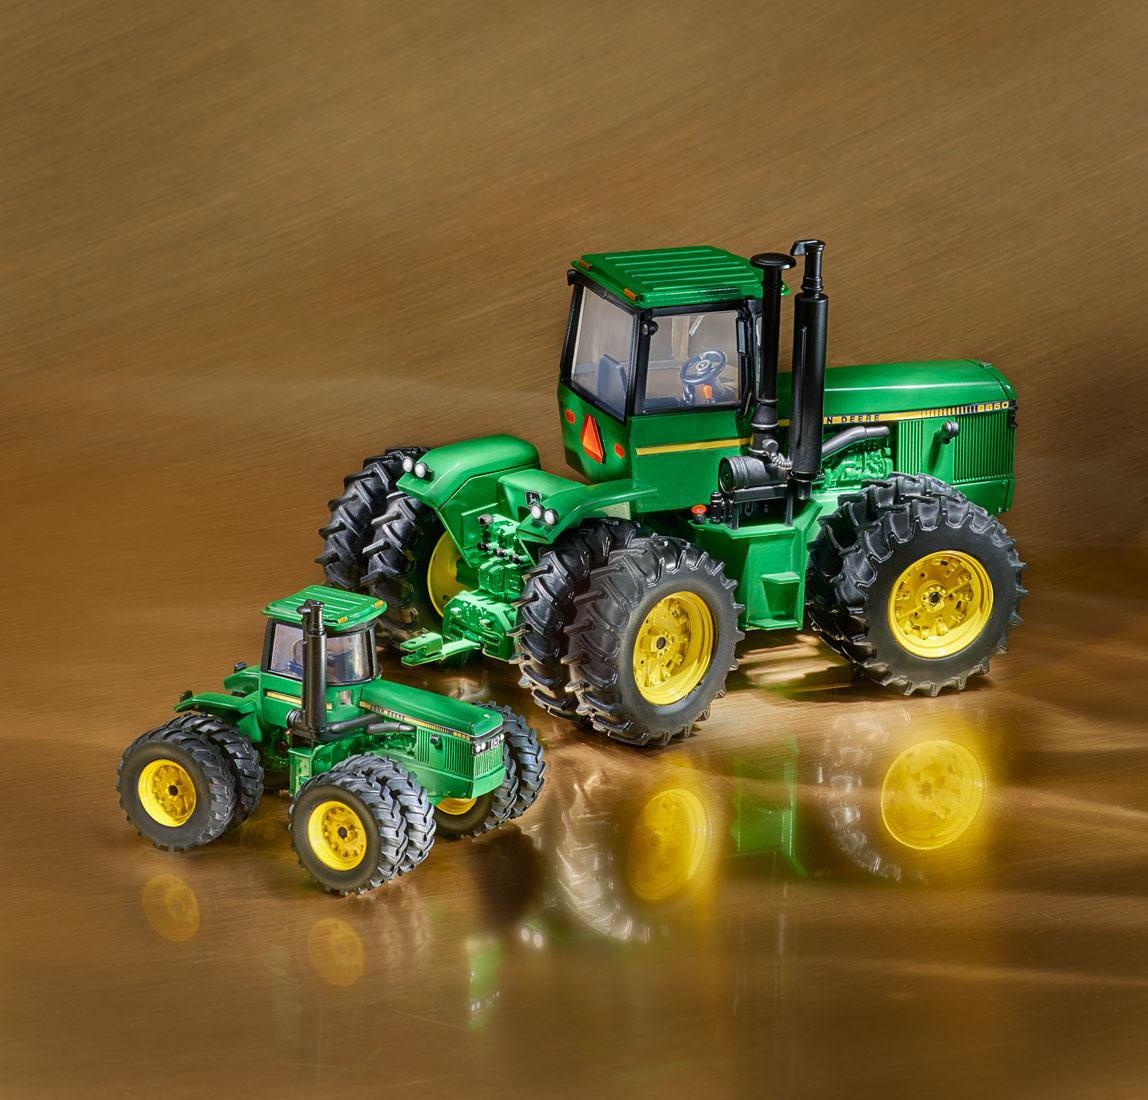 Green Toy Farmer tractors